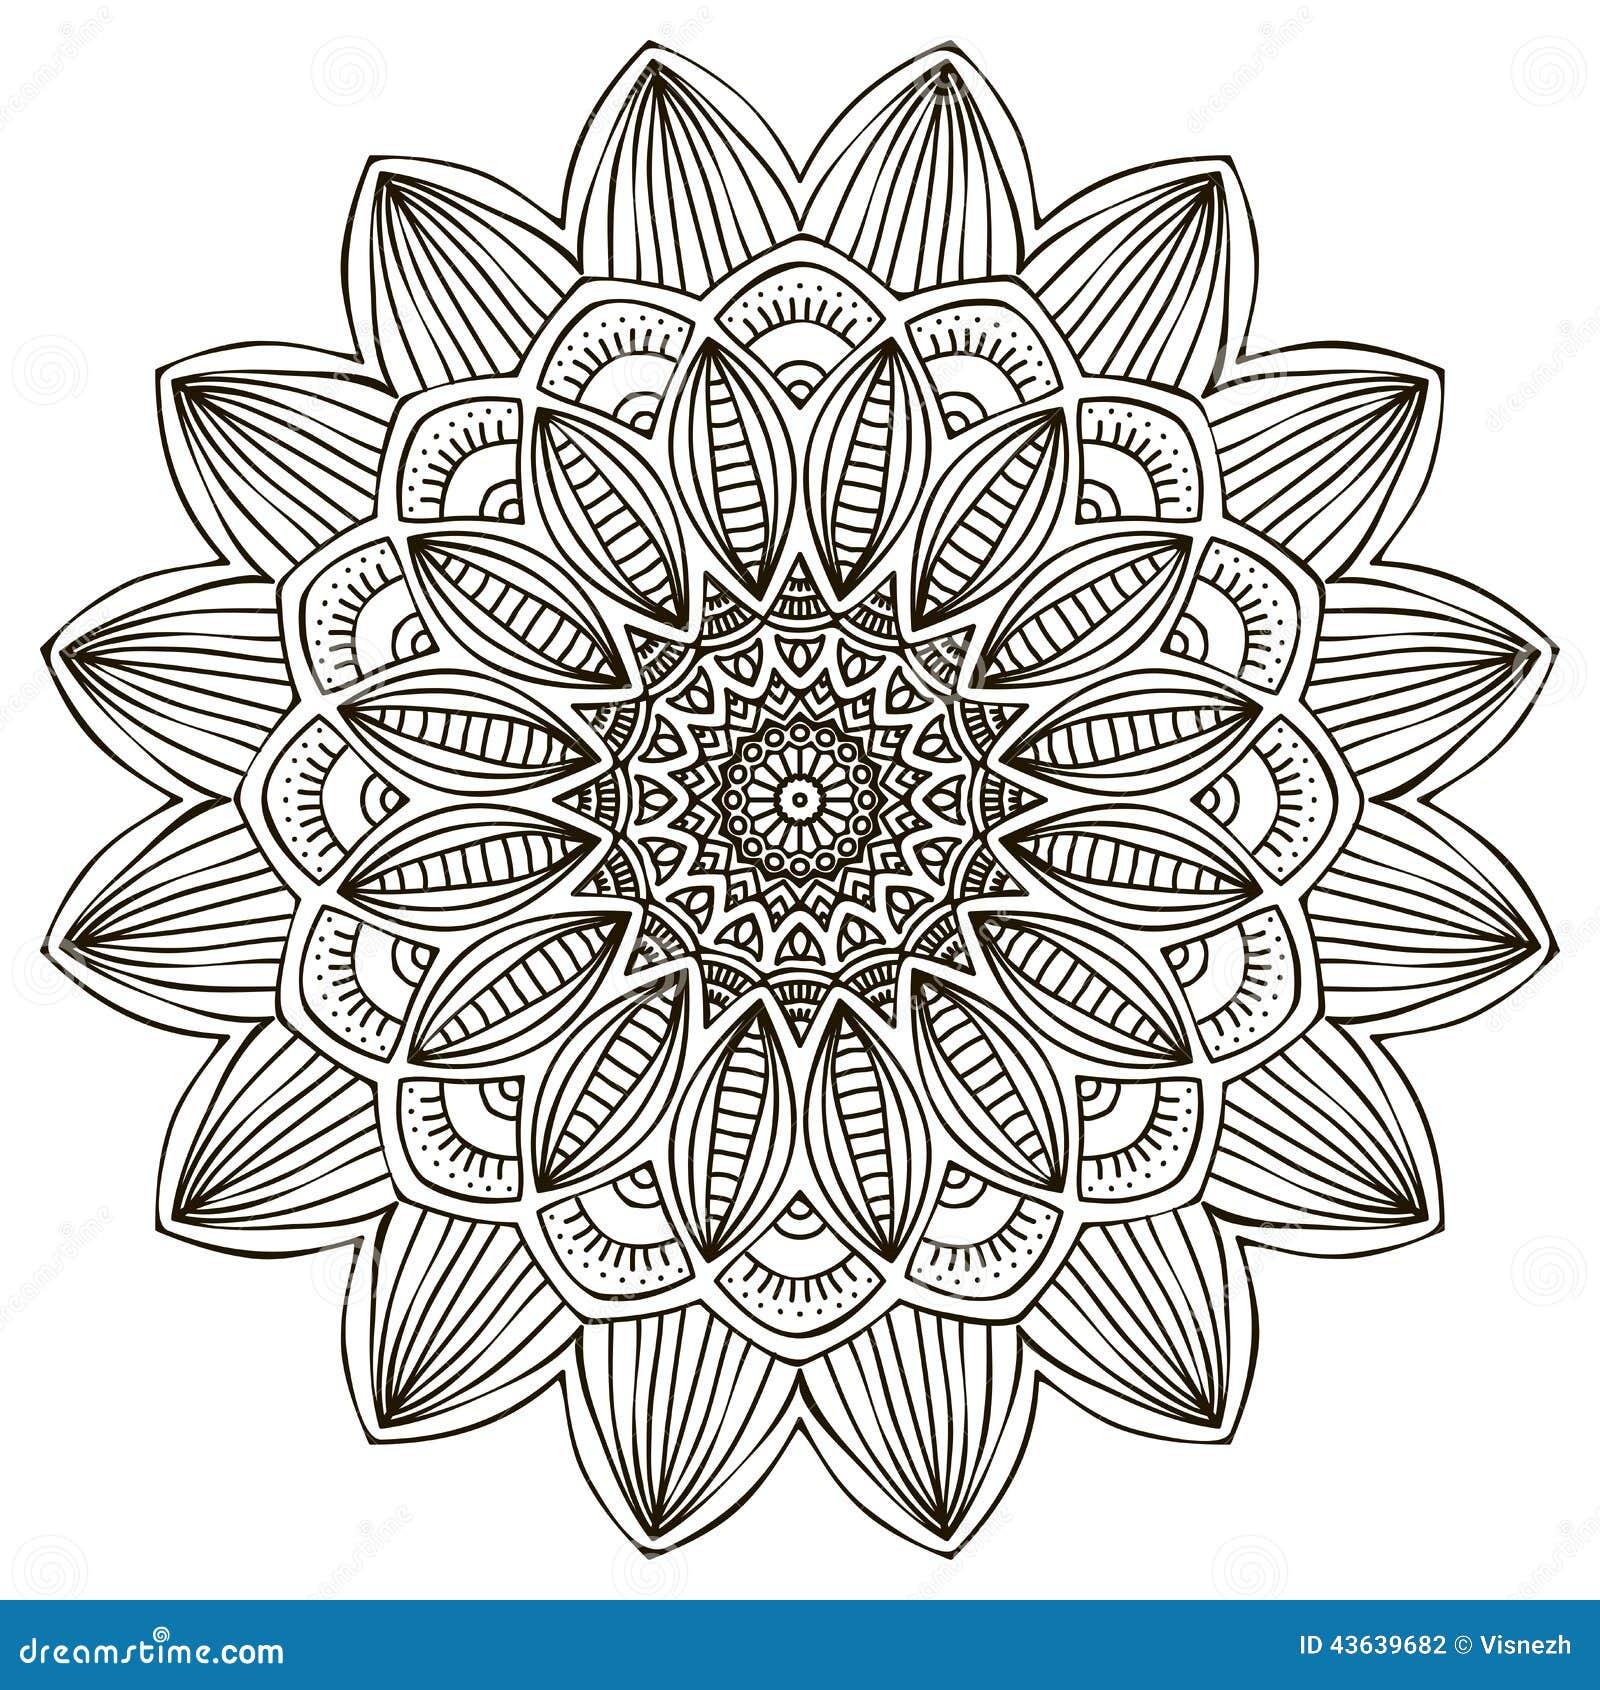 Mandala stock vector. Image of decorate, grunge, islam